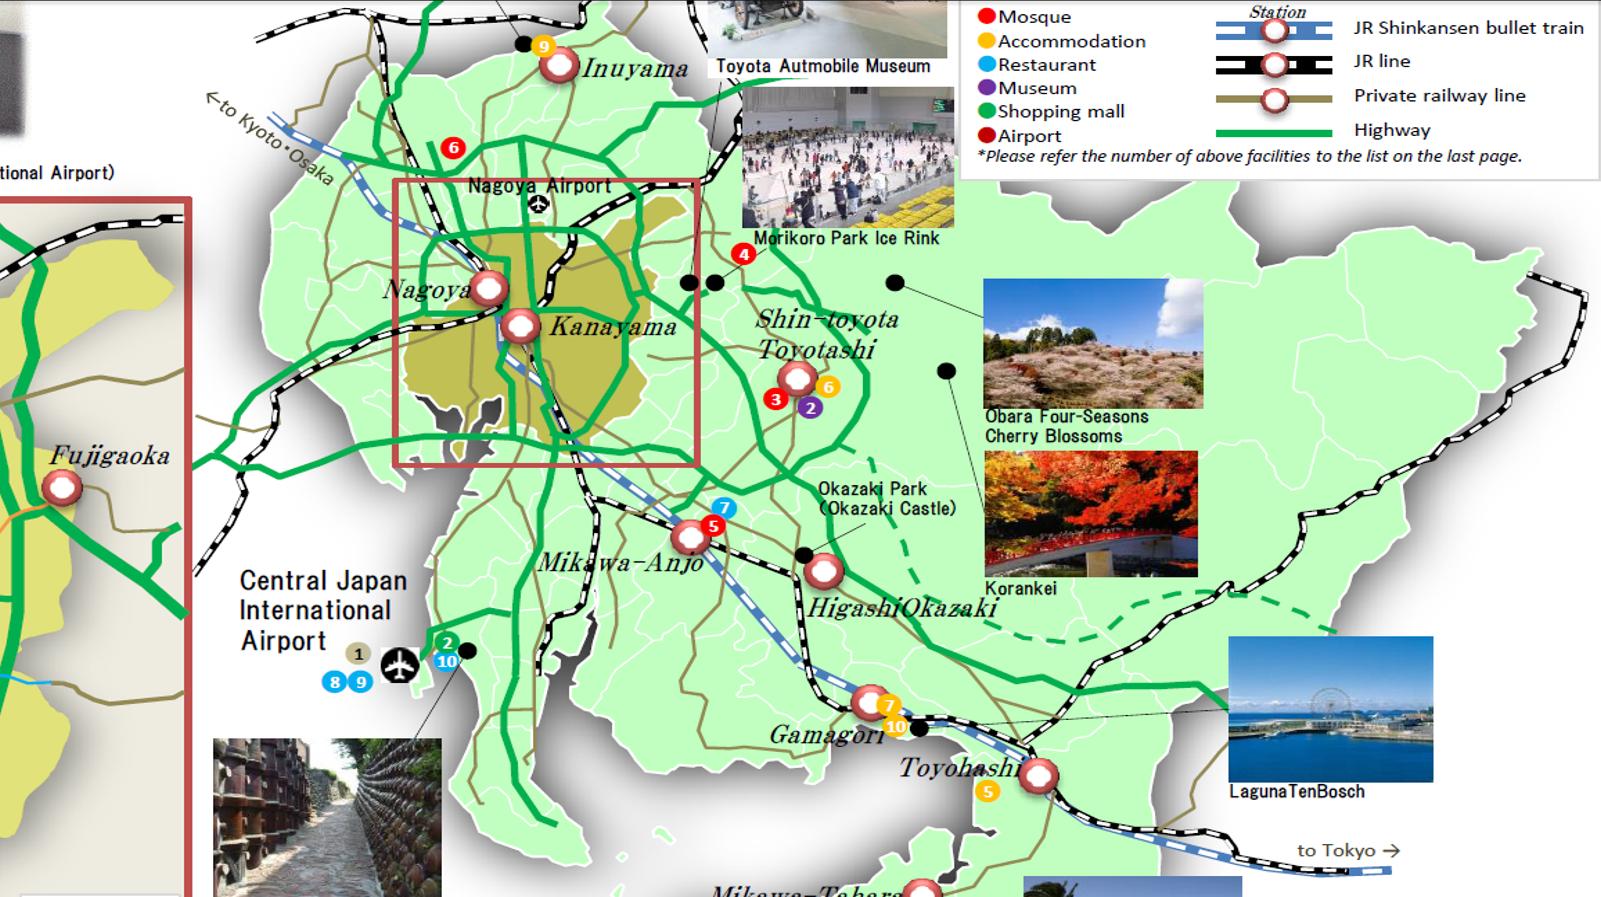 Aichi Prefecture, where Nagoya is located, made a Muslim-friendly ...